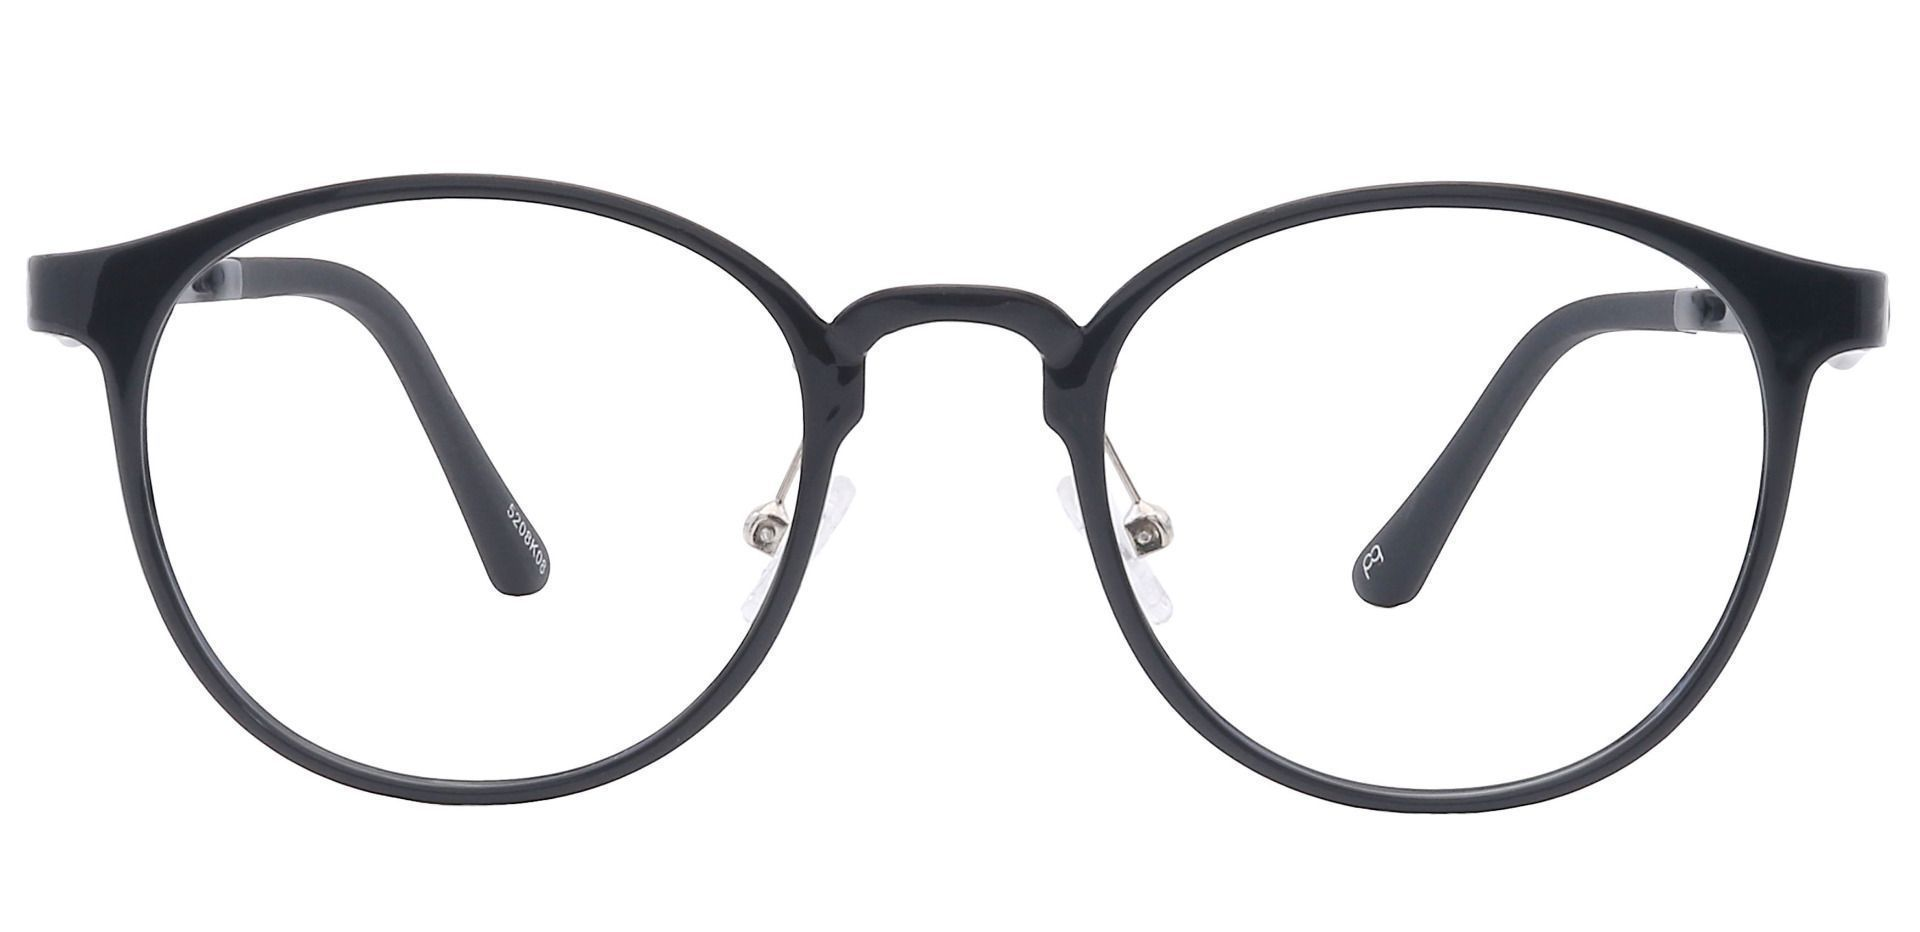 Nimbus Oval Progressive Glasses - Black